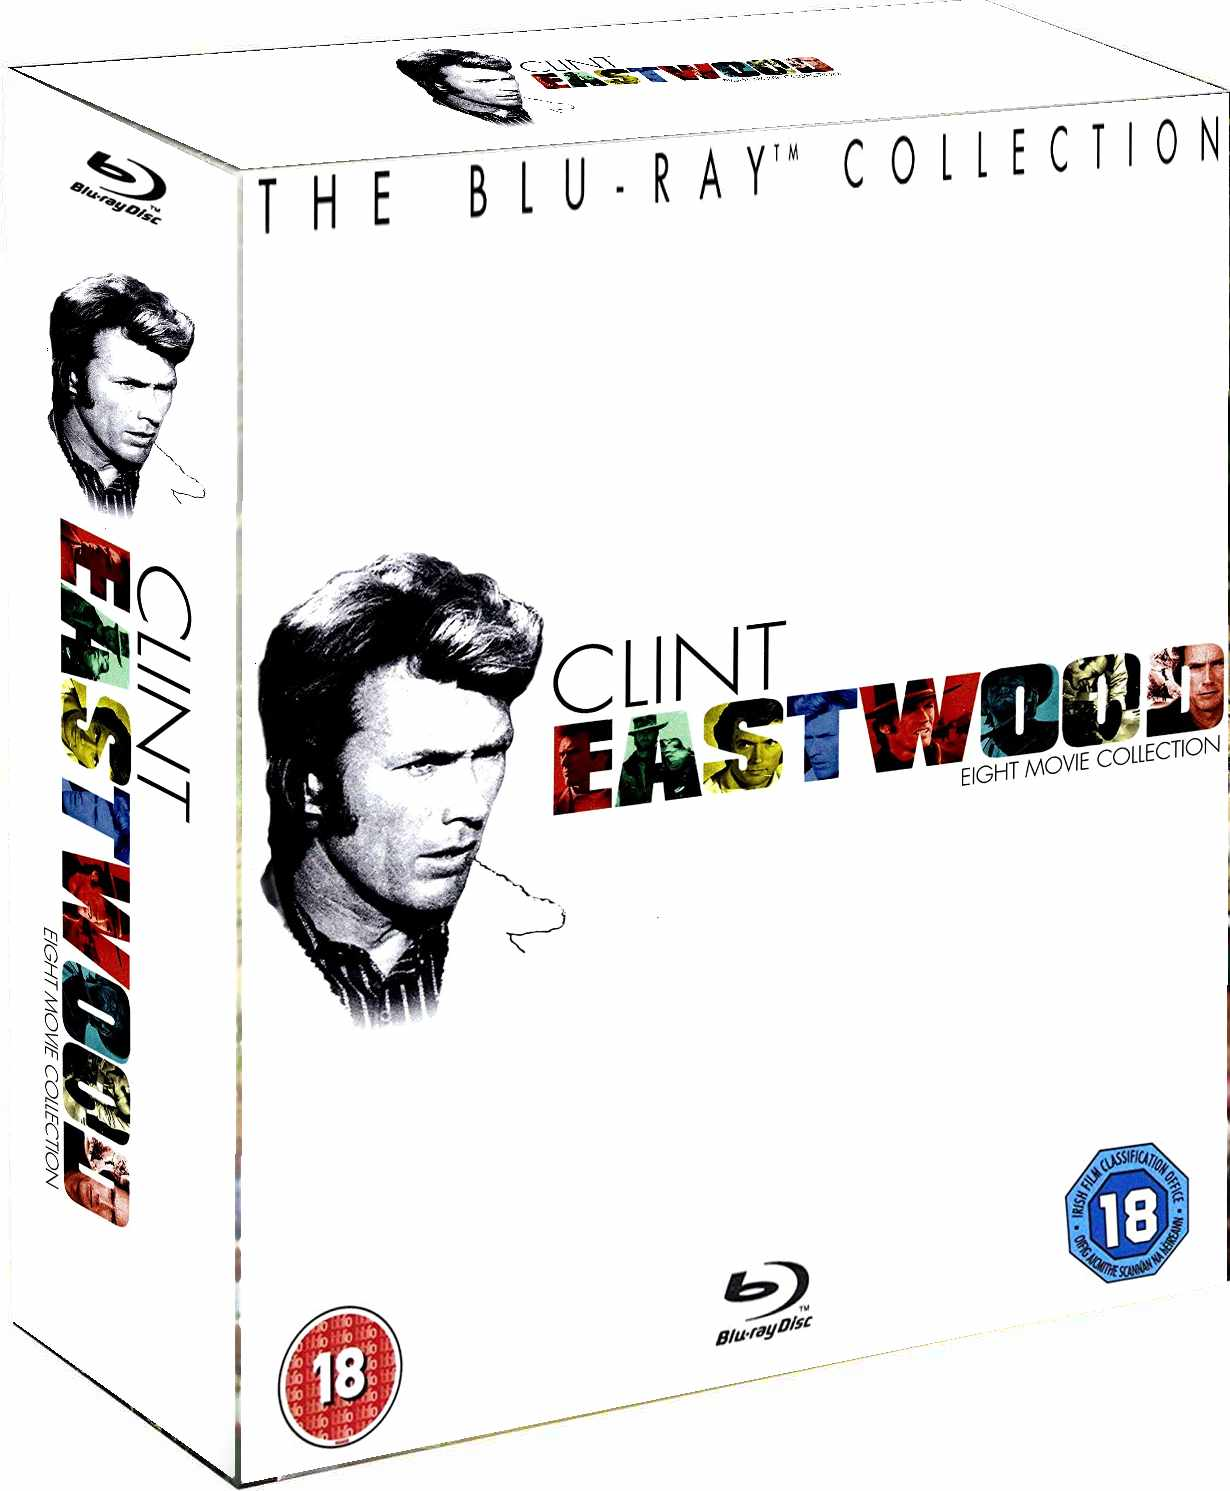 Clint Eastwood - Kolekce 8 filmů (8 BD) - Blu-ray